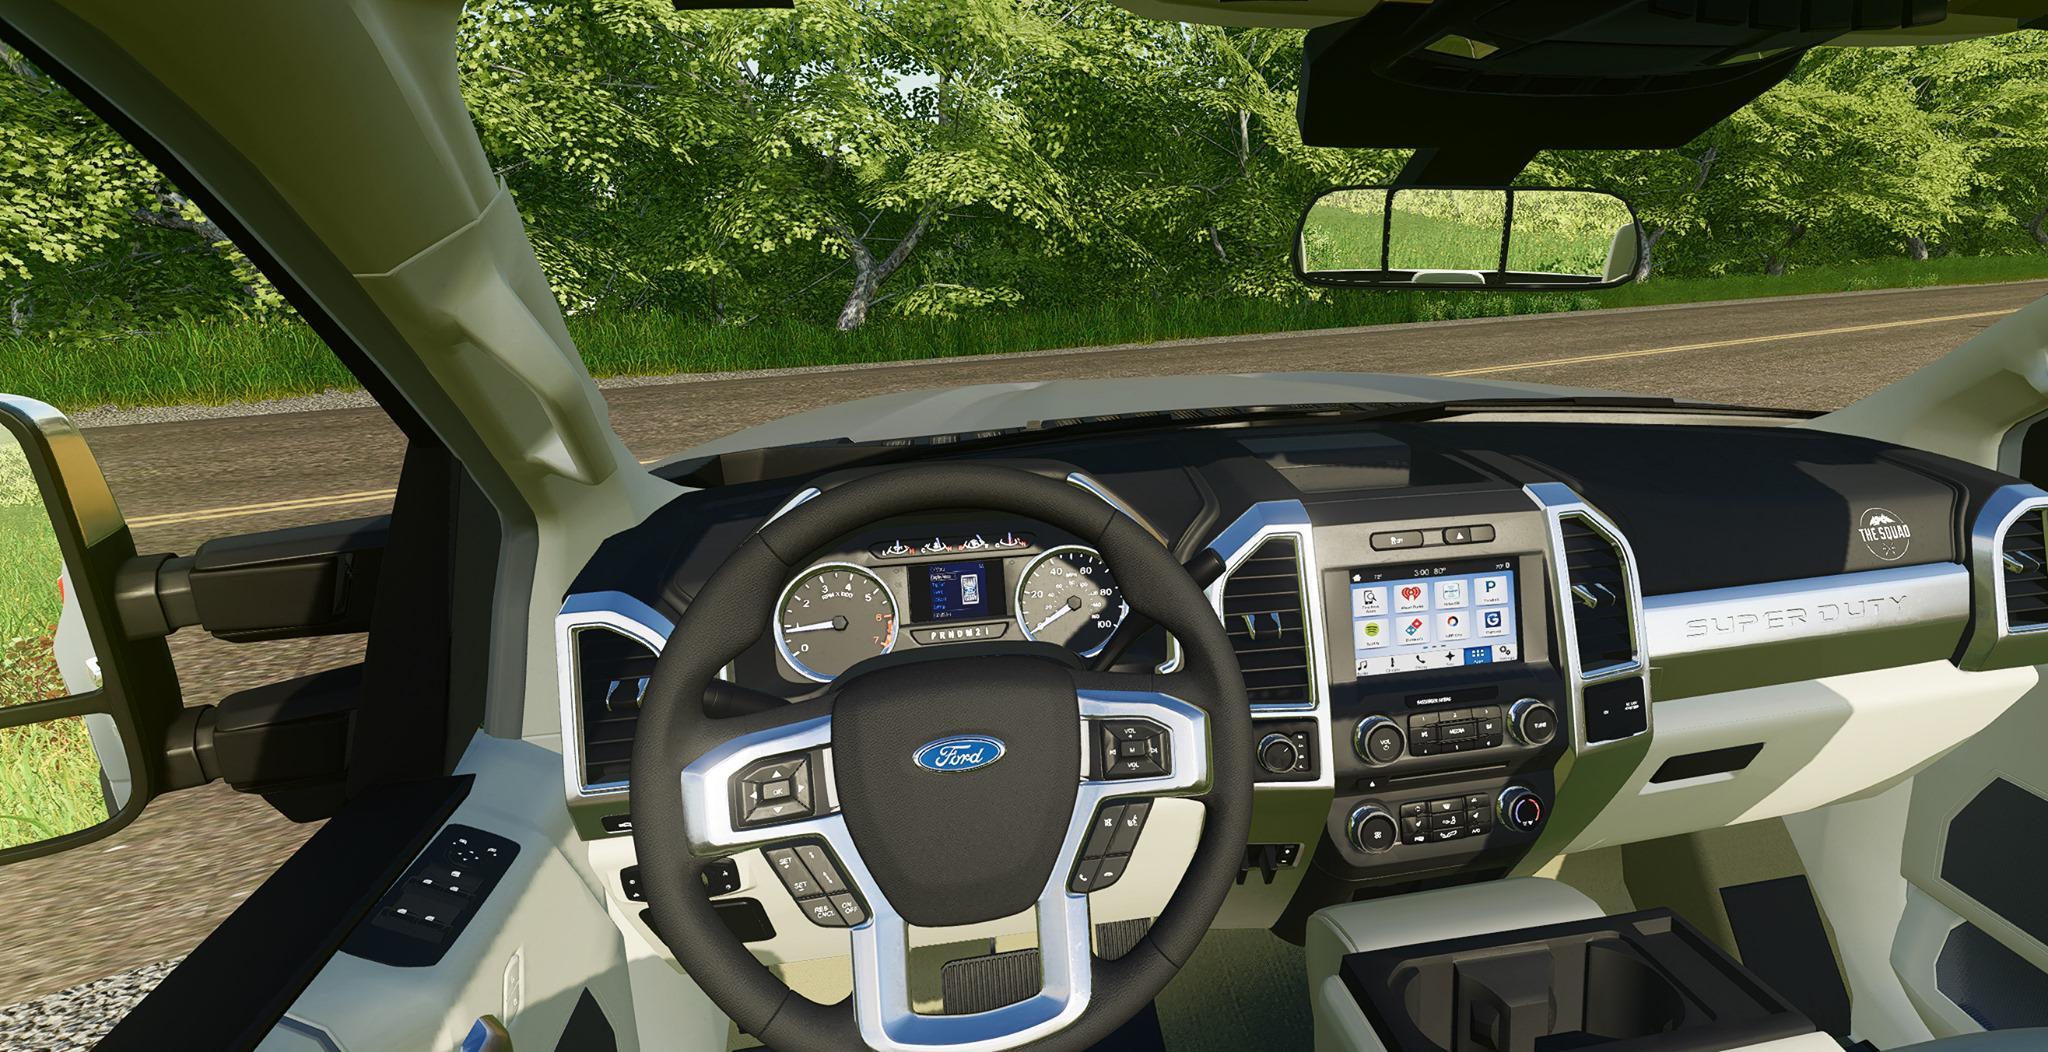 EXP19 Ford F-250 Superduty 2017 v1 0 FS19 - Farming